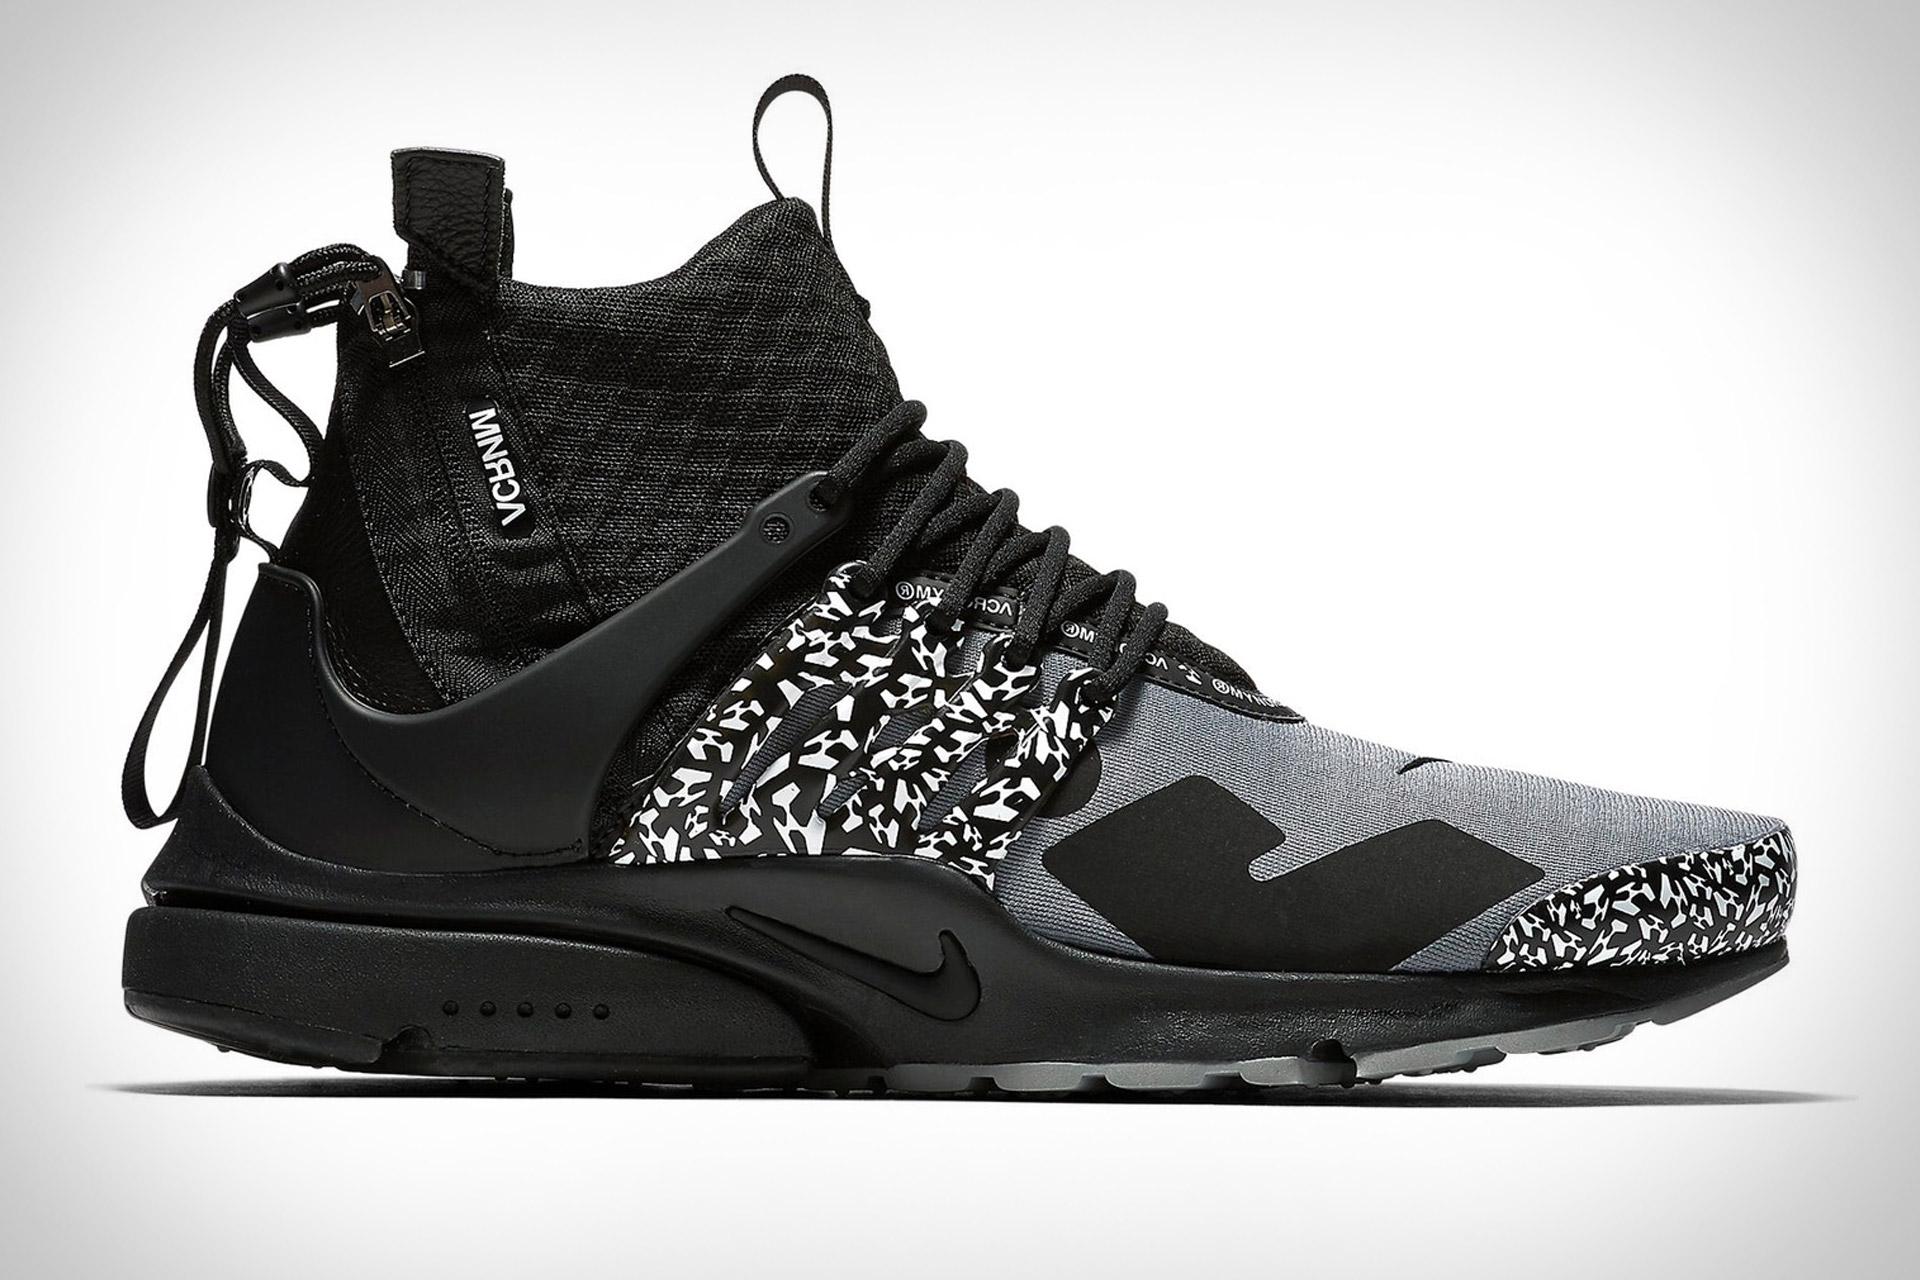 Nike x Acronym Air Presto Mid Utility Sneaker | Uncrate